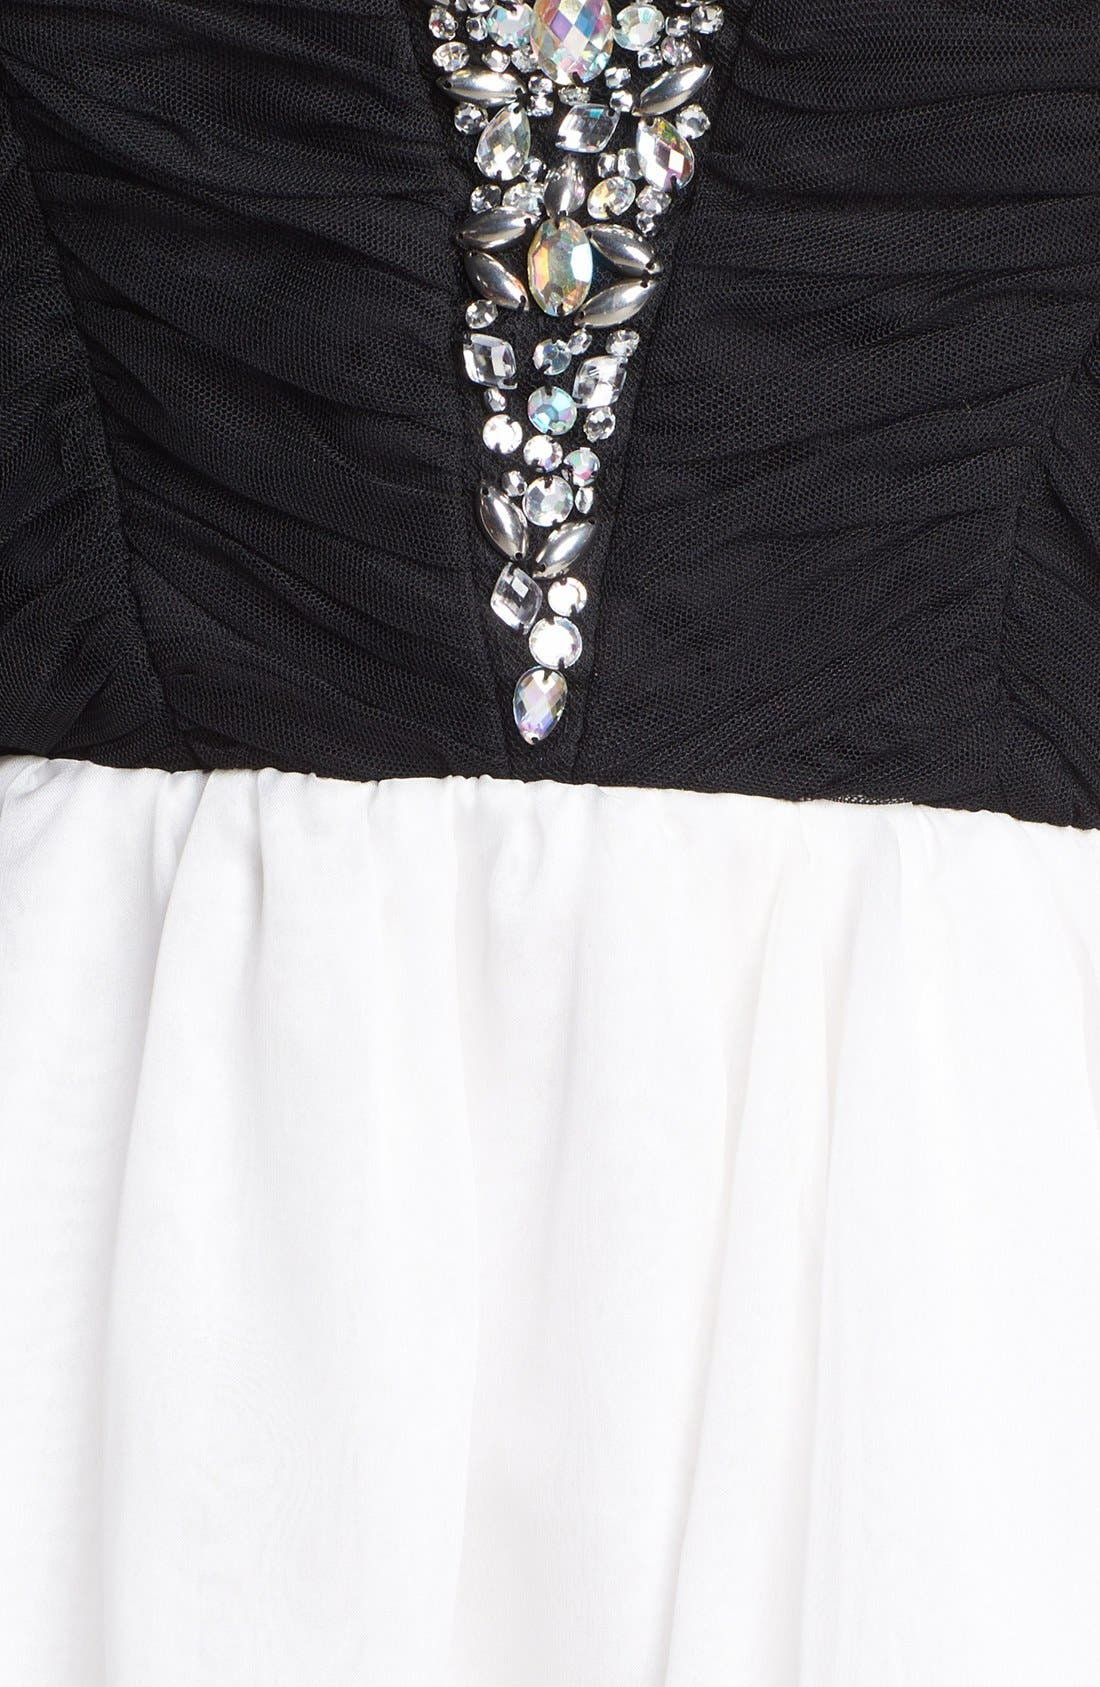 AS U WISH, Secret Charm Jeweled Mesh Fit & Flare Dress, Alternate thumbnail 3, color, 009